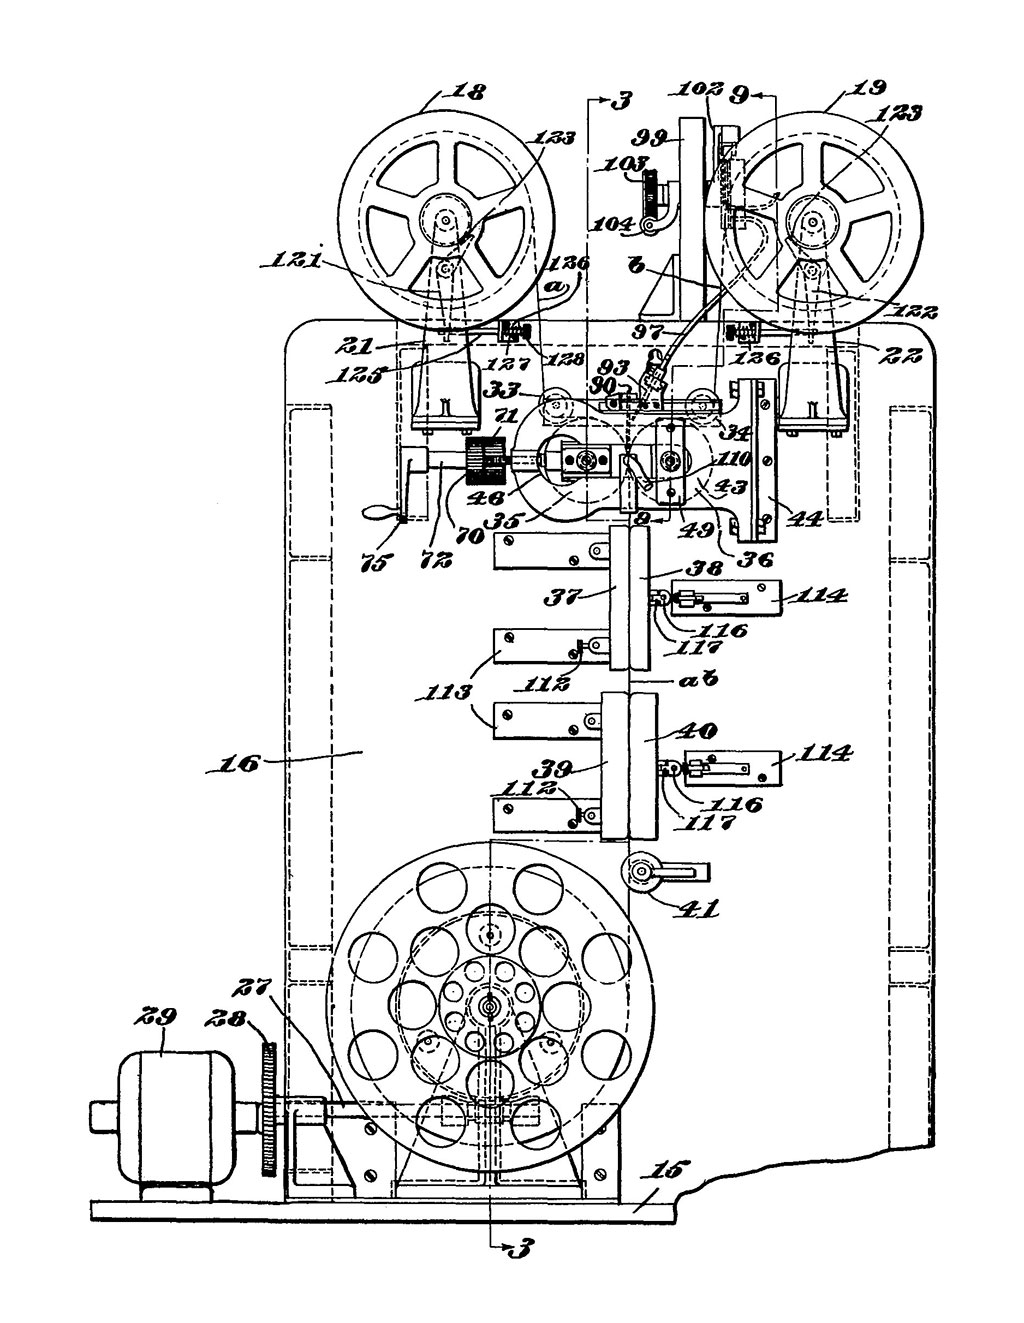 Pretty 2009 chevy radio wiring diagram ideas everything you need